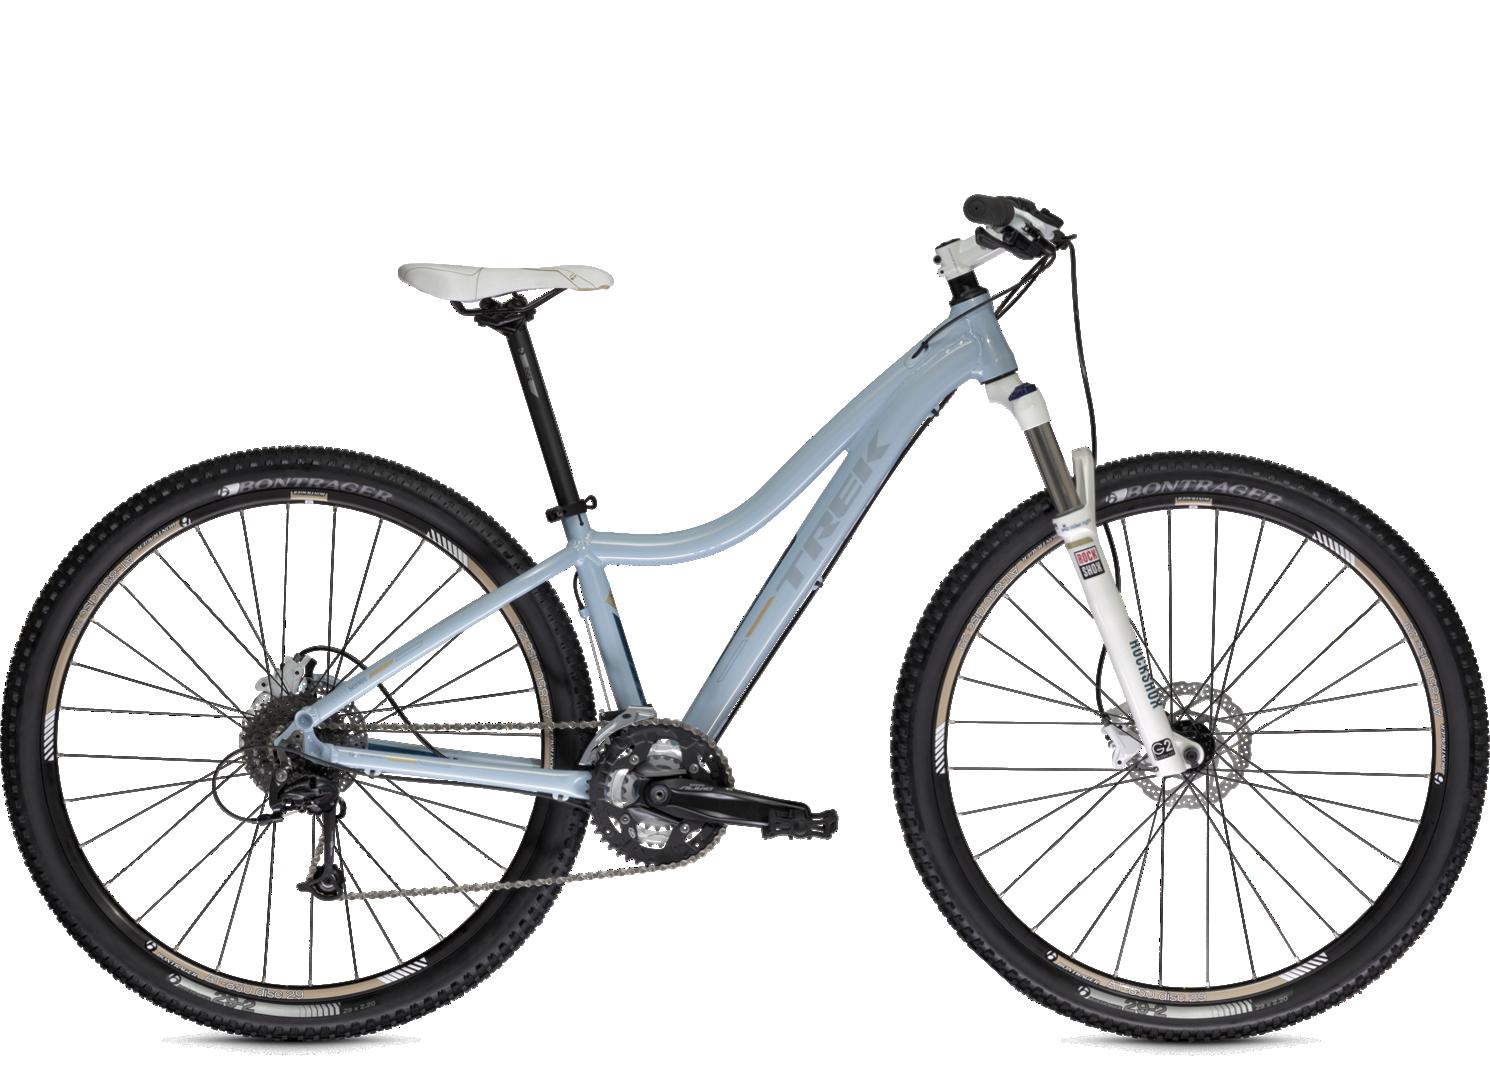 trek cali s mountain bike womens bicycle wsd hardtail 29er. Black Bedroom Furniture Sets. Home Design Ideas